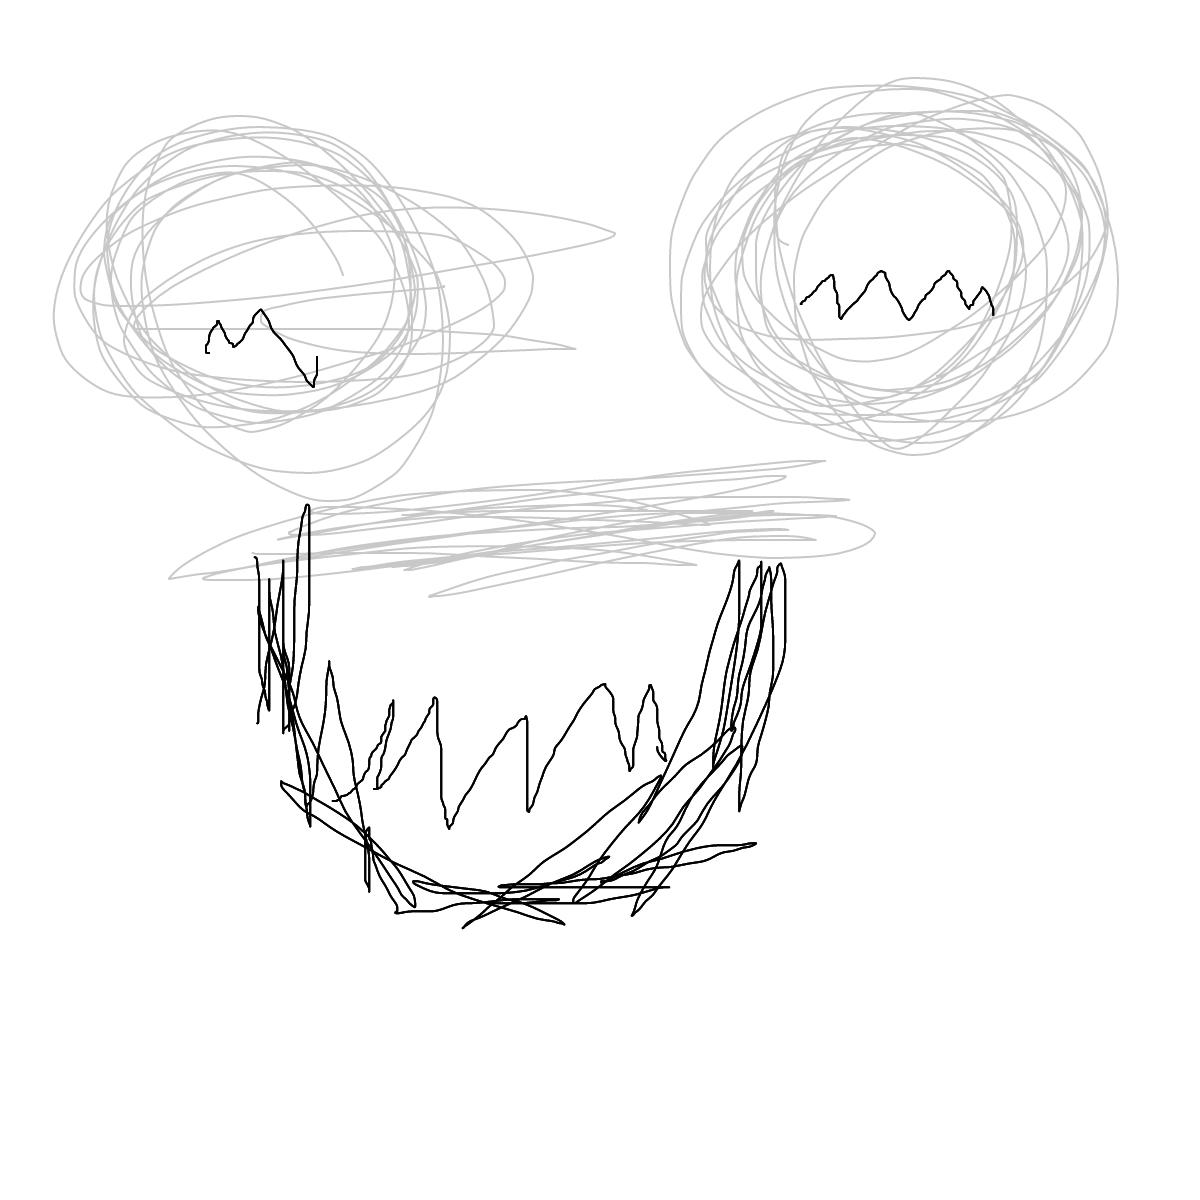 BAAAM drawing#23202 lat:52.4756278991699200lng: 13.4060945510864260